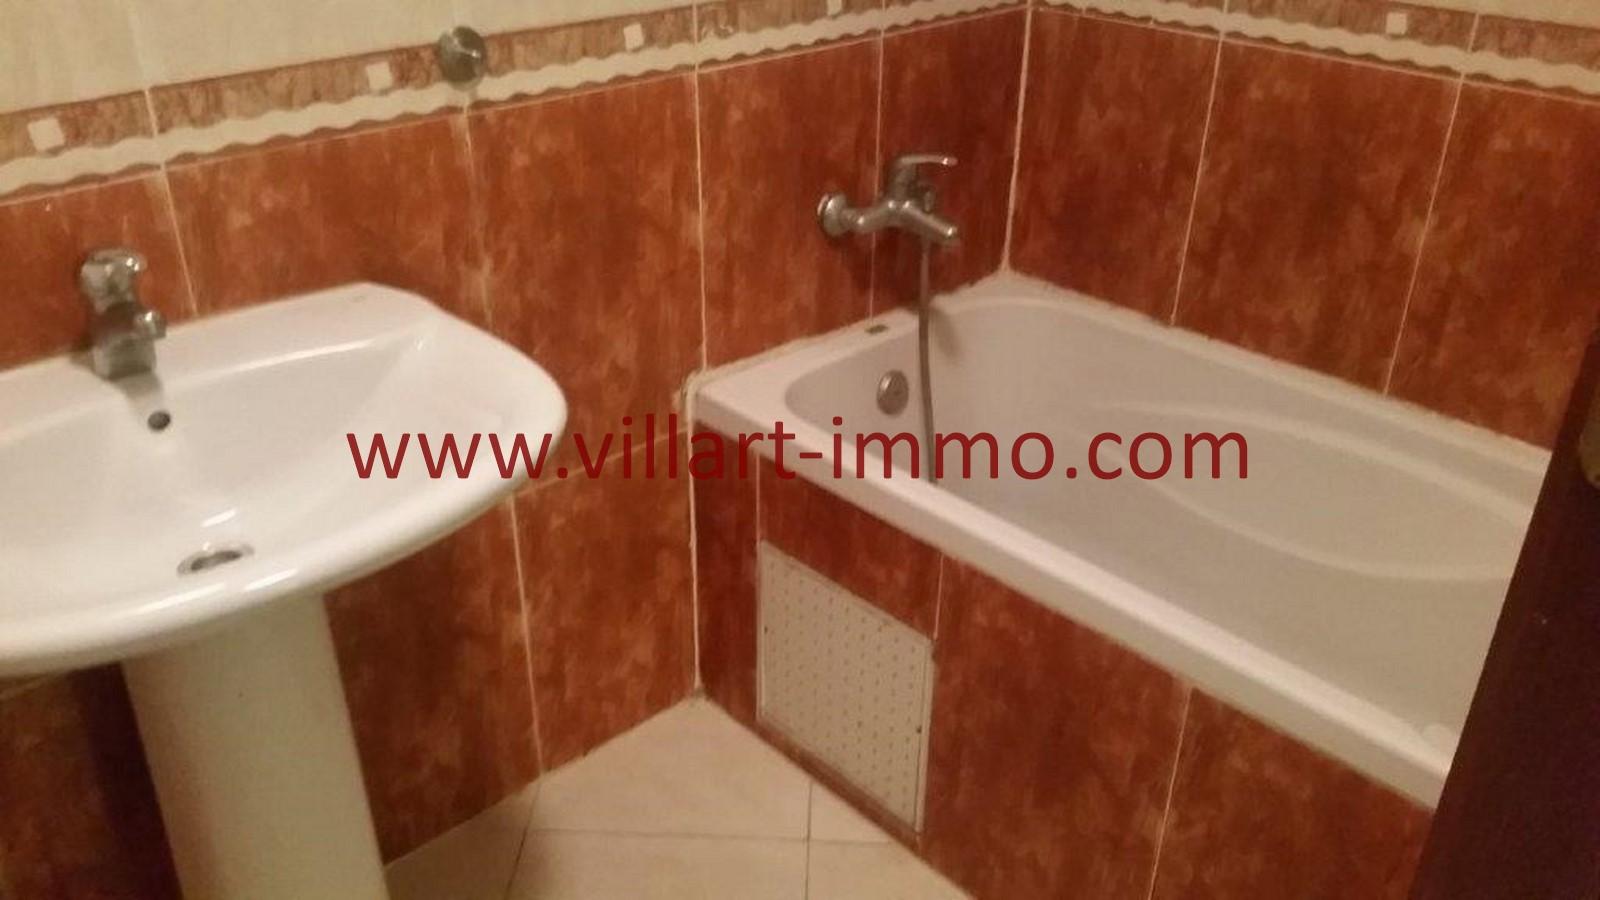 8-A louer-Tanger-Appartement-Non meublée-Centre ville-Salle de bain-L1029